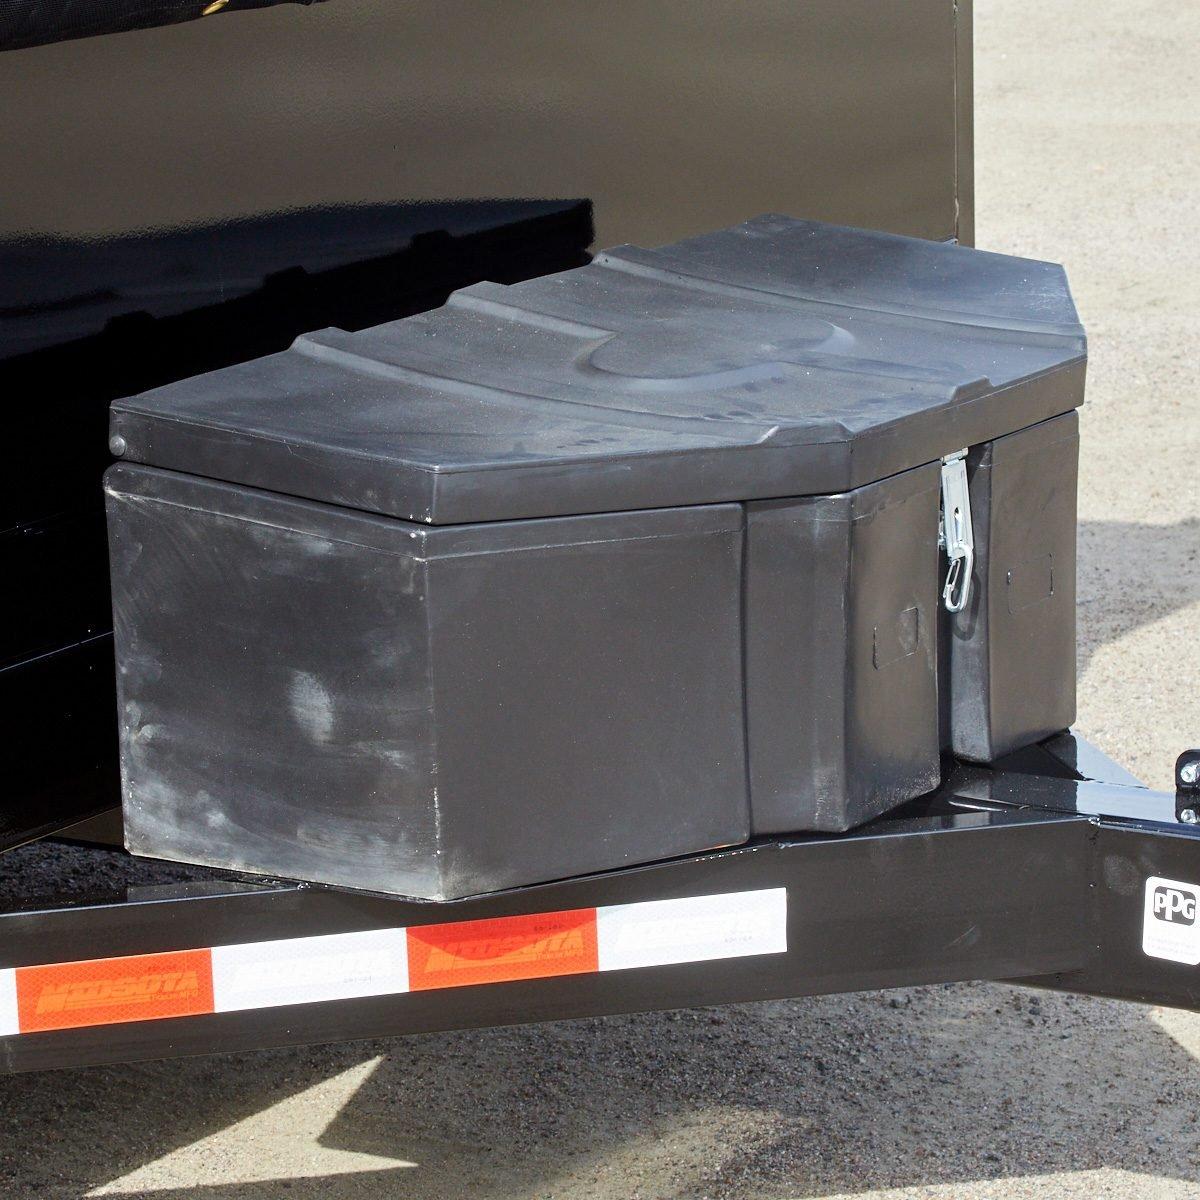 Trailer tool box | Construction Pro Tips